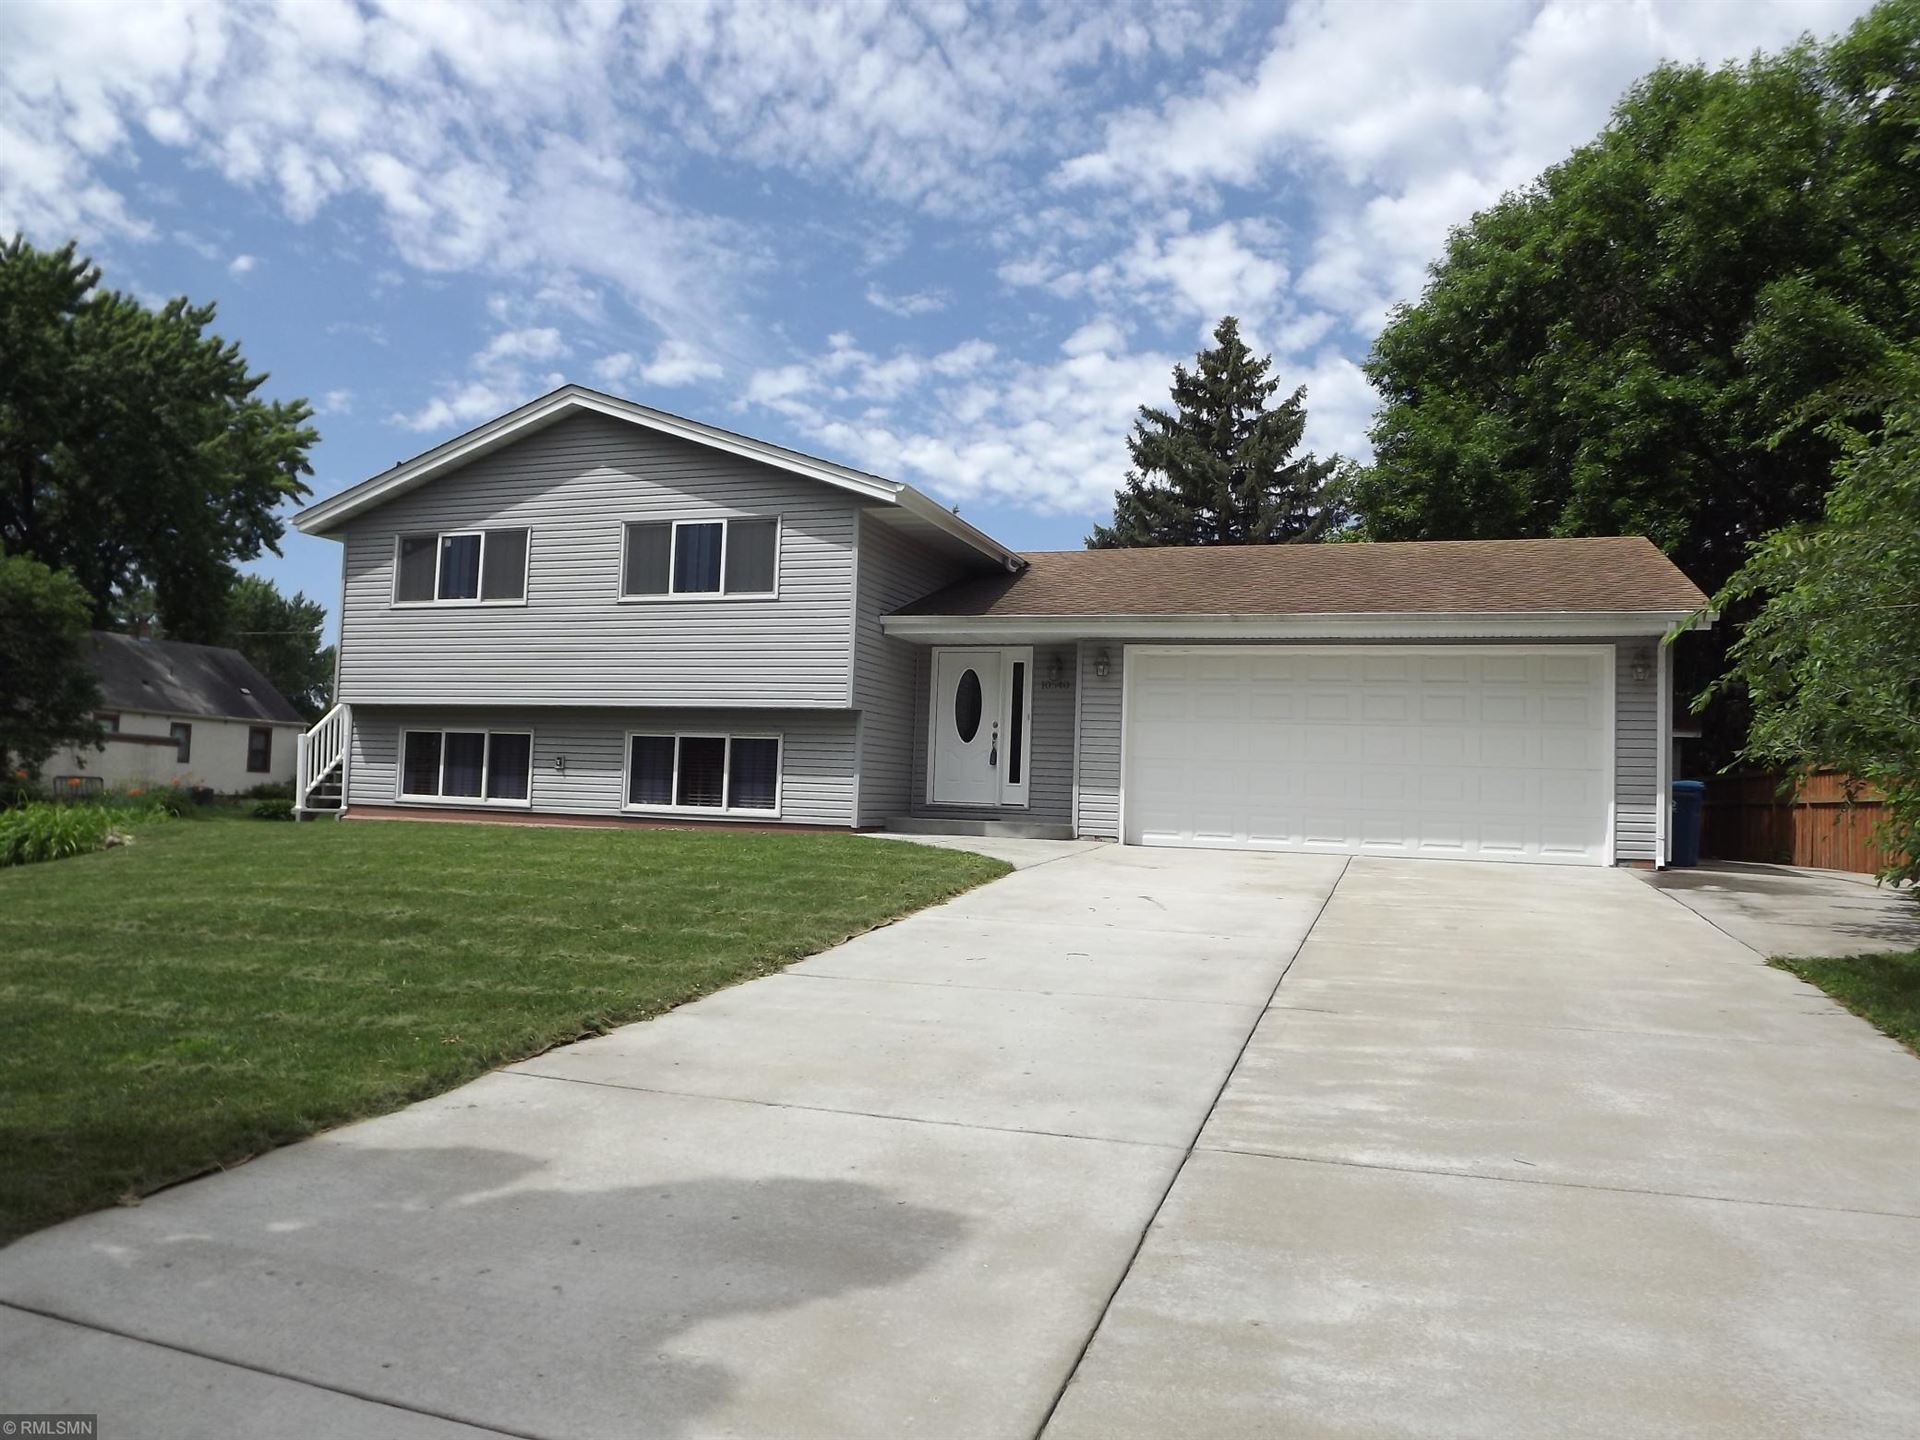 10540 Oregon Circle, Bloomington, MN 55438 - MLS#: 5624677